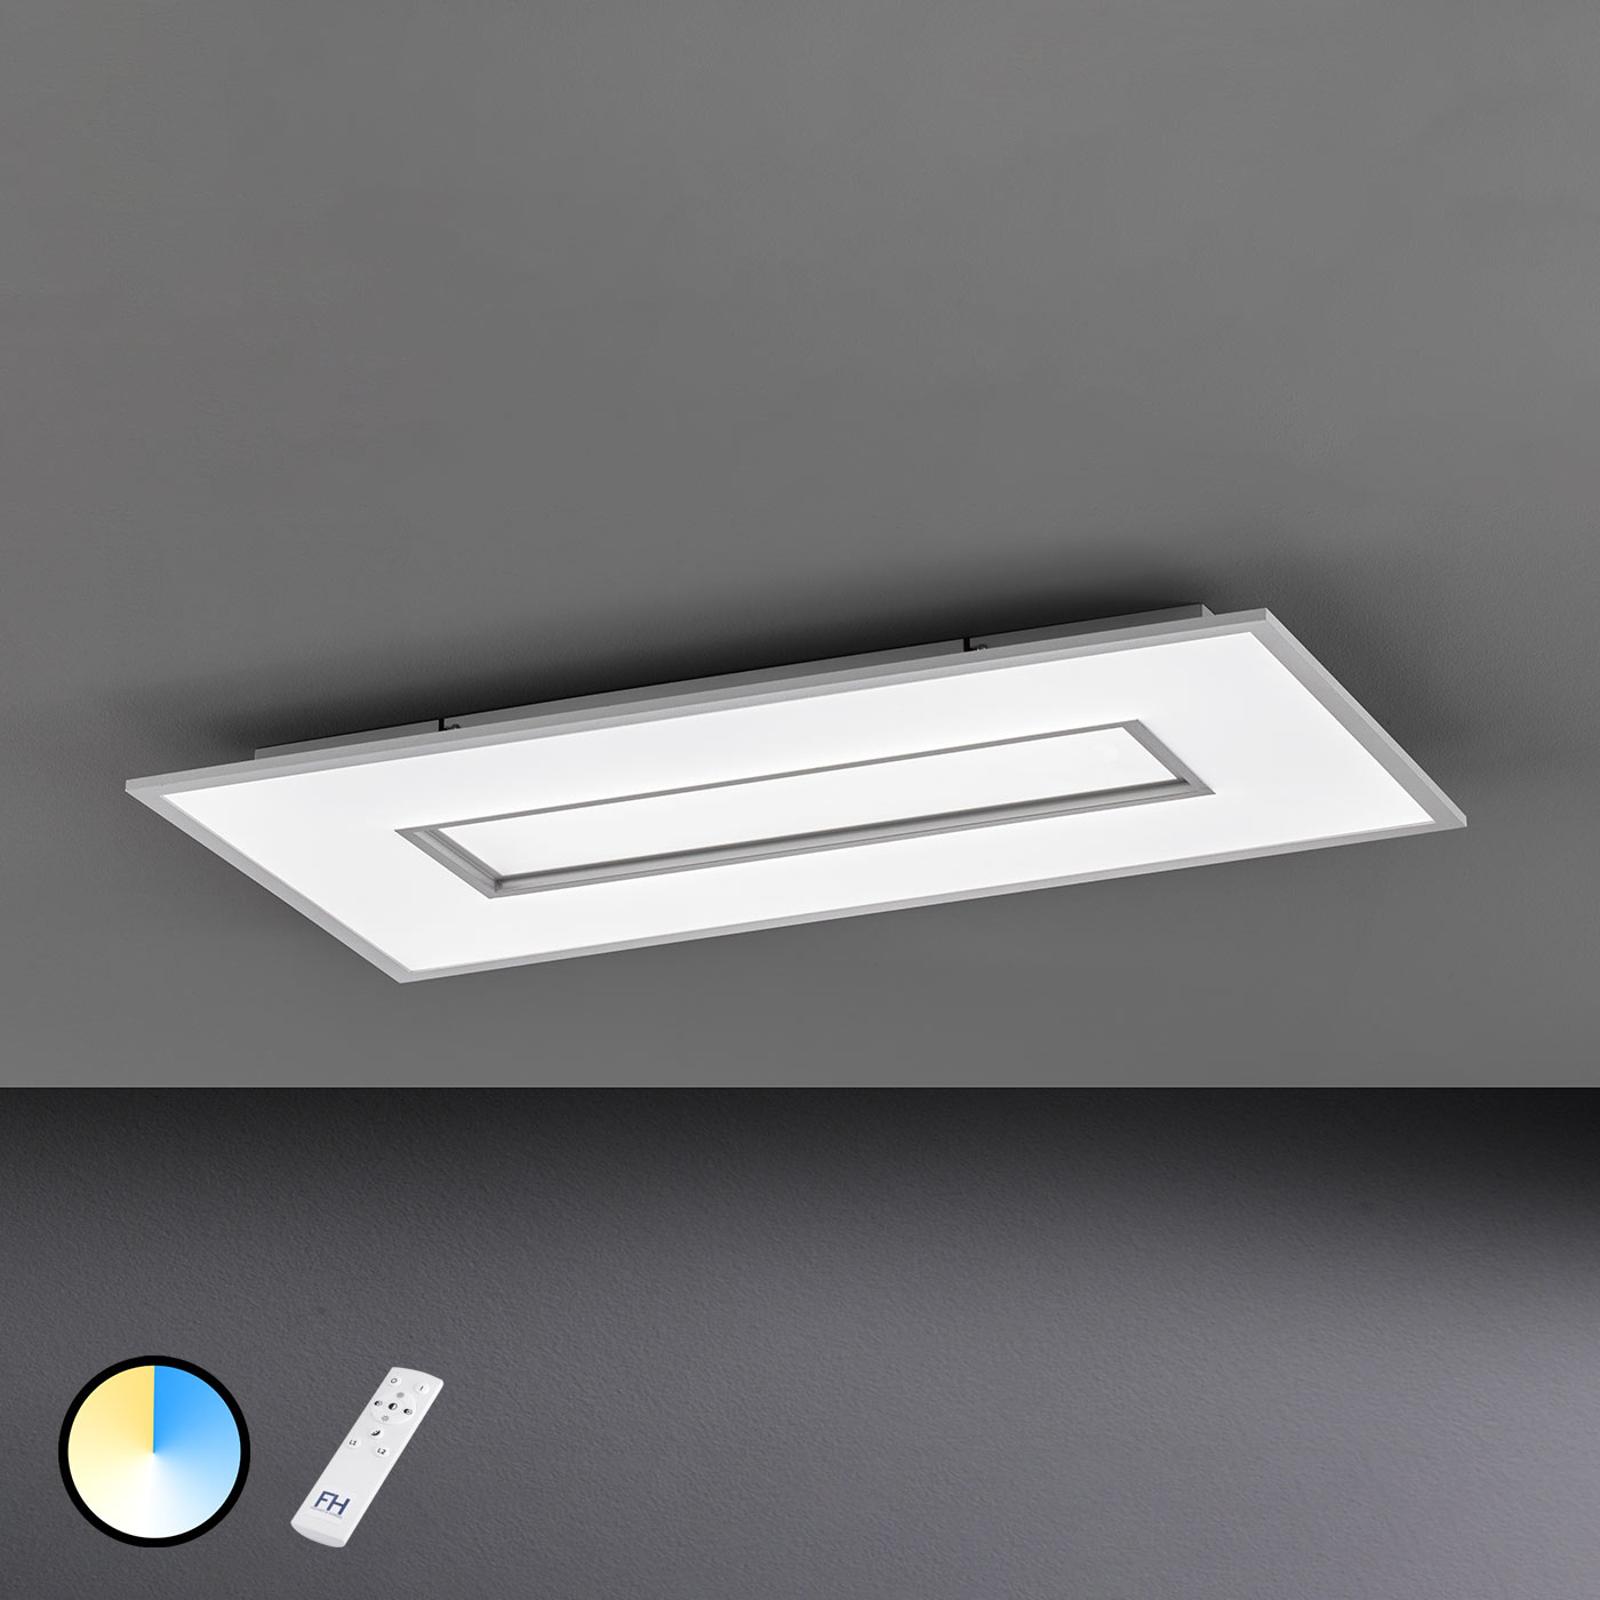 Lampa sufitowa LED Tiara prostokąt 80x40 cm